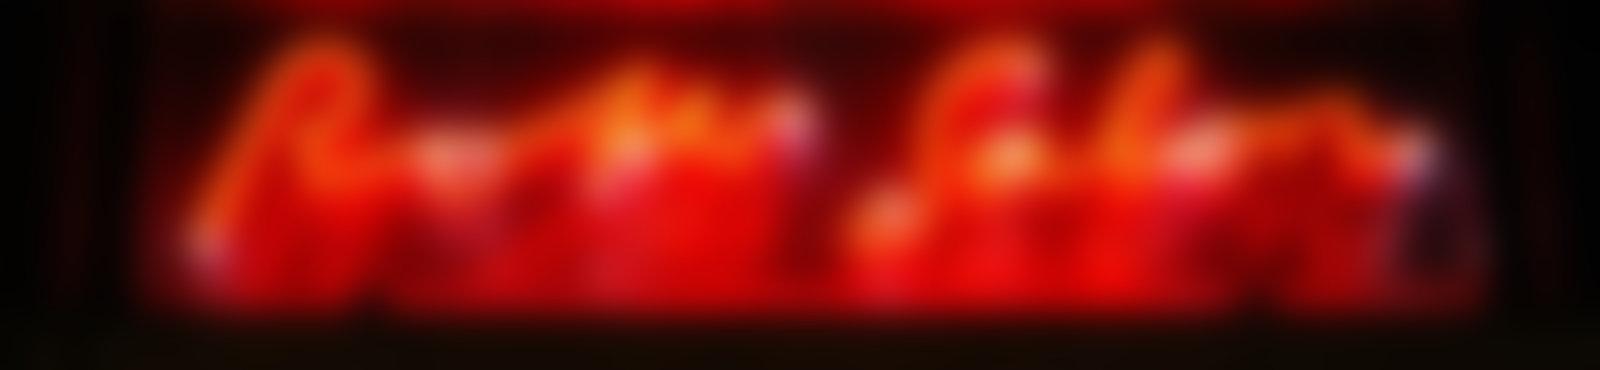 Blurred roter salon